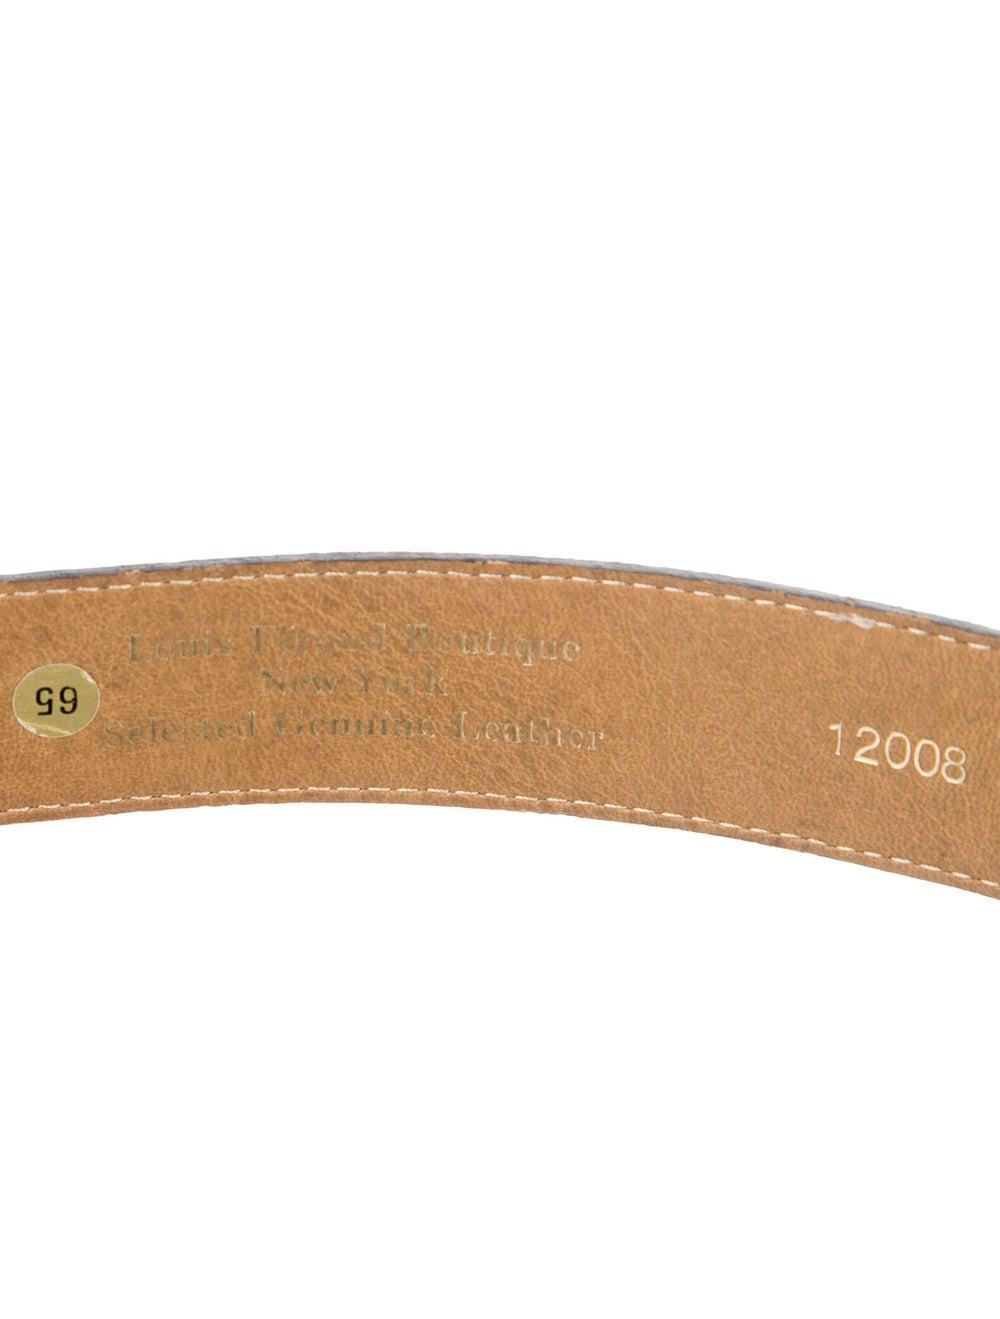 Gianni Versace Leather Belt Gold - image 2